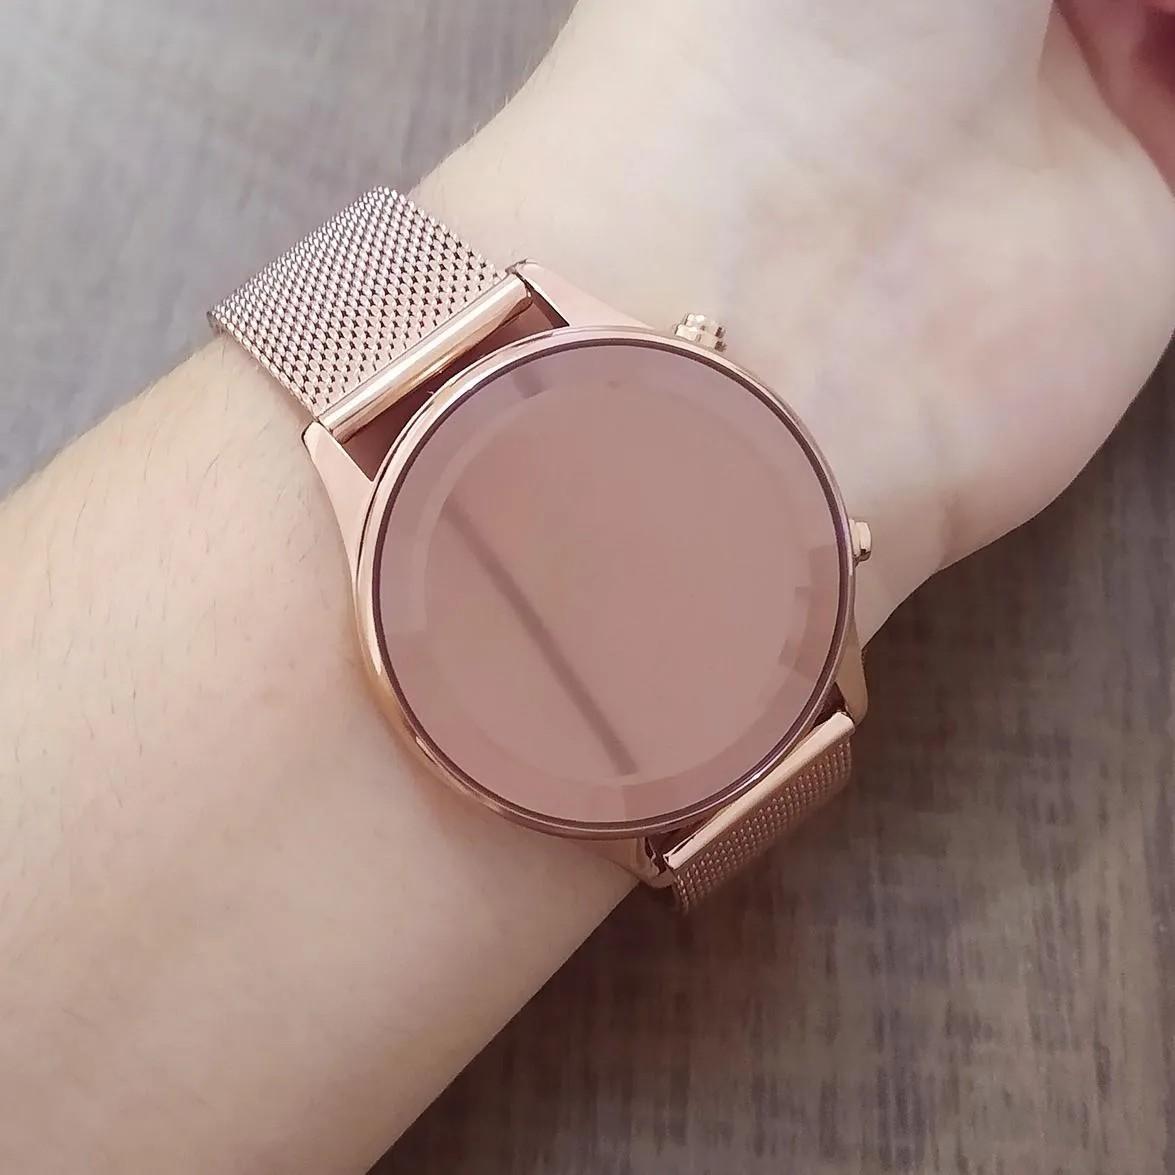 Relógio Led Feminino Rose Clássico Lince Orient - LDR4648L RXRX